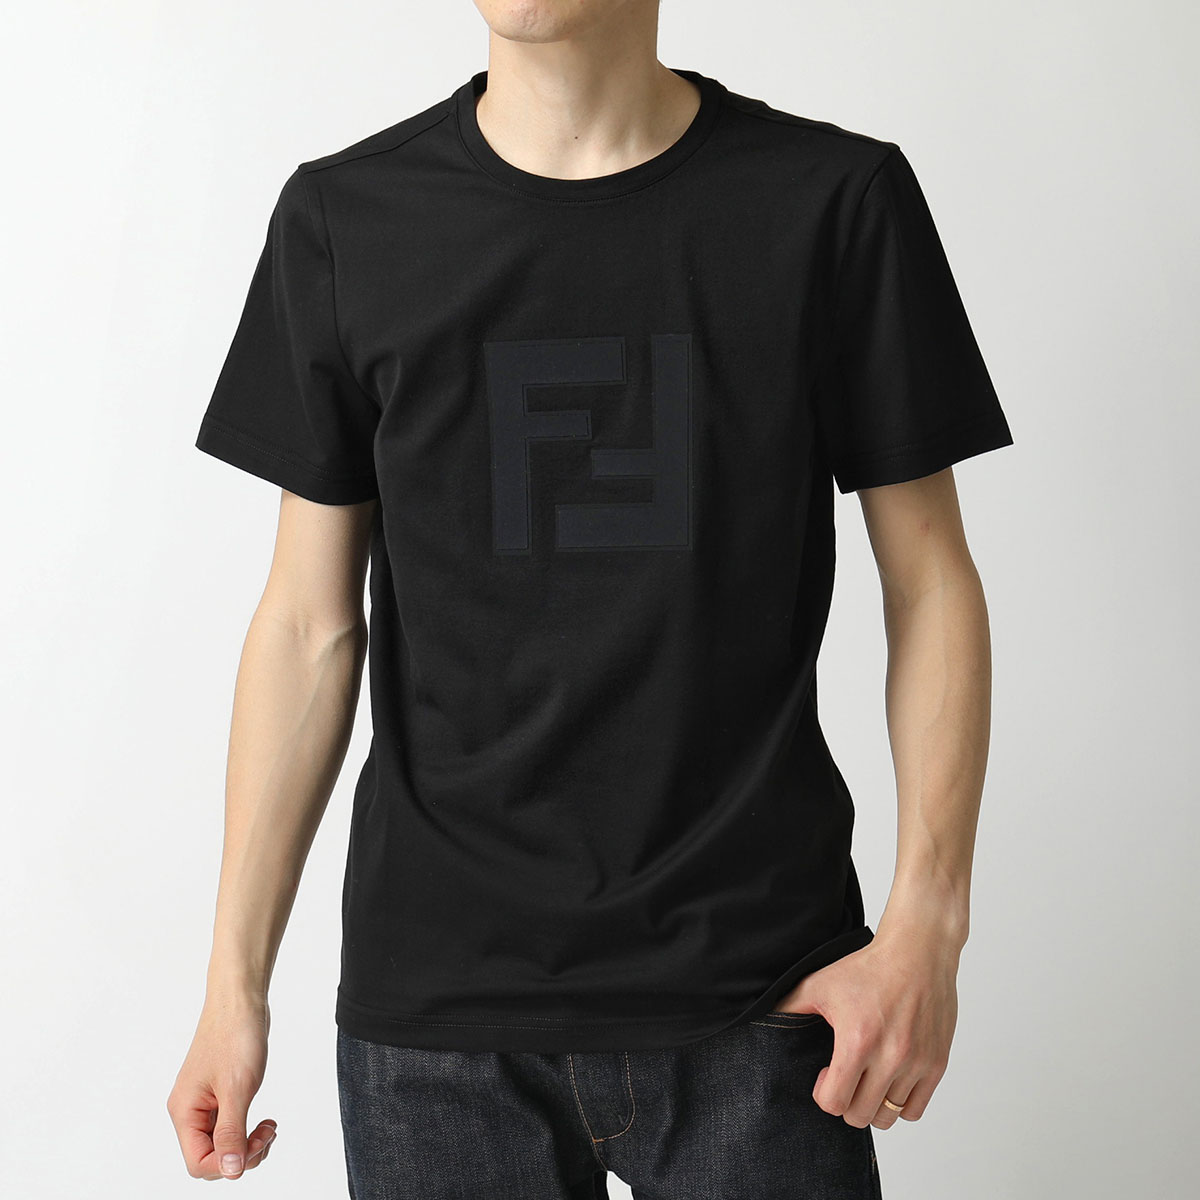 FENDI フェンディ FAF532 A54P F0GME/BLACK クルーネック 半袖 Tシャツ カットソー FF異素材ロゴ メンズ